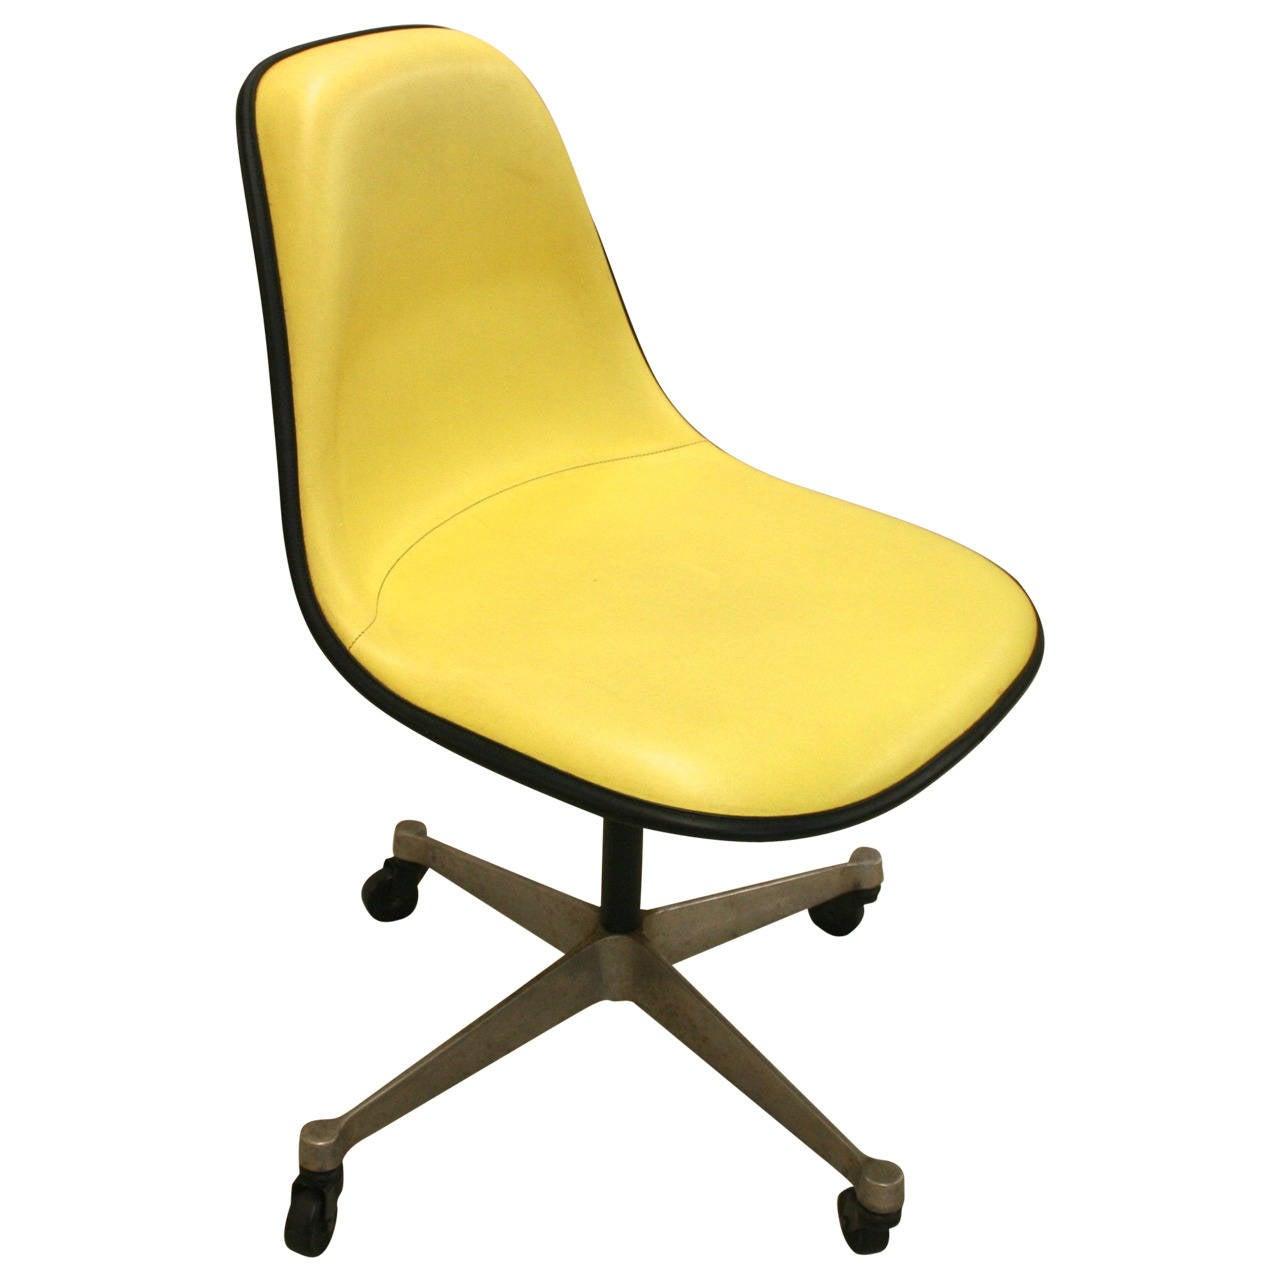 Mid Century Herman Miller Fiberglass Shell Chair at 1stdibs